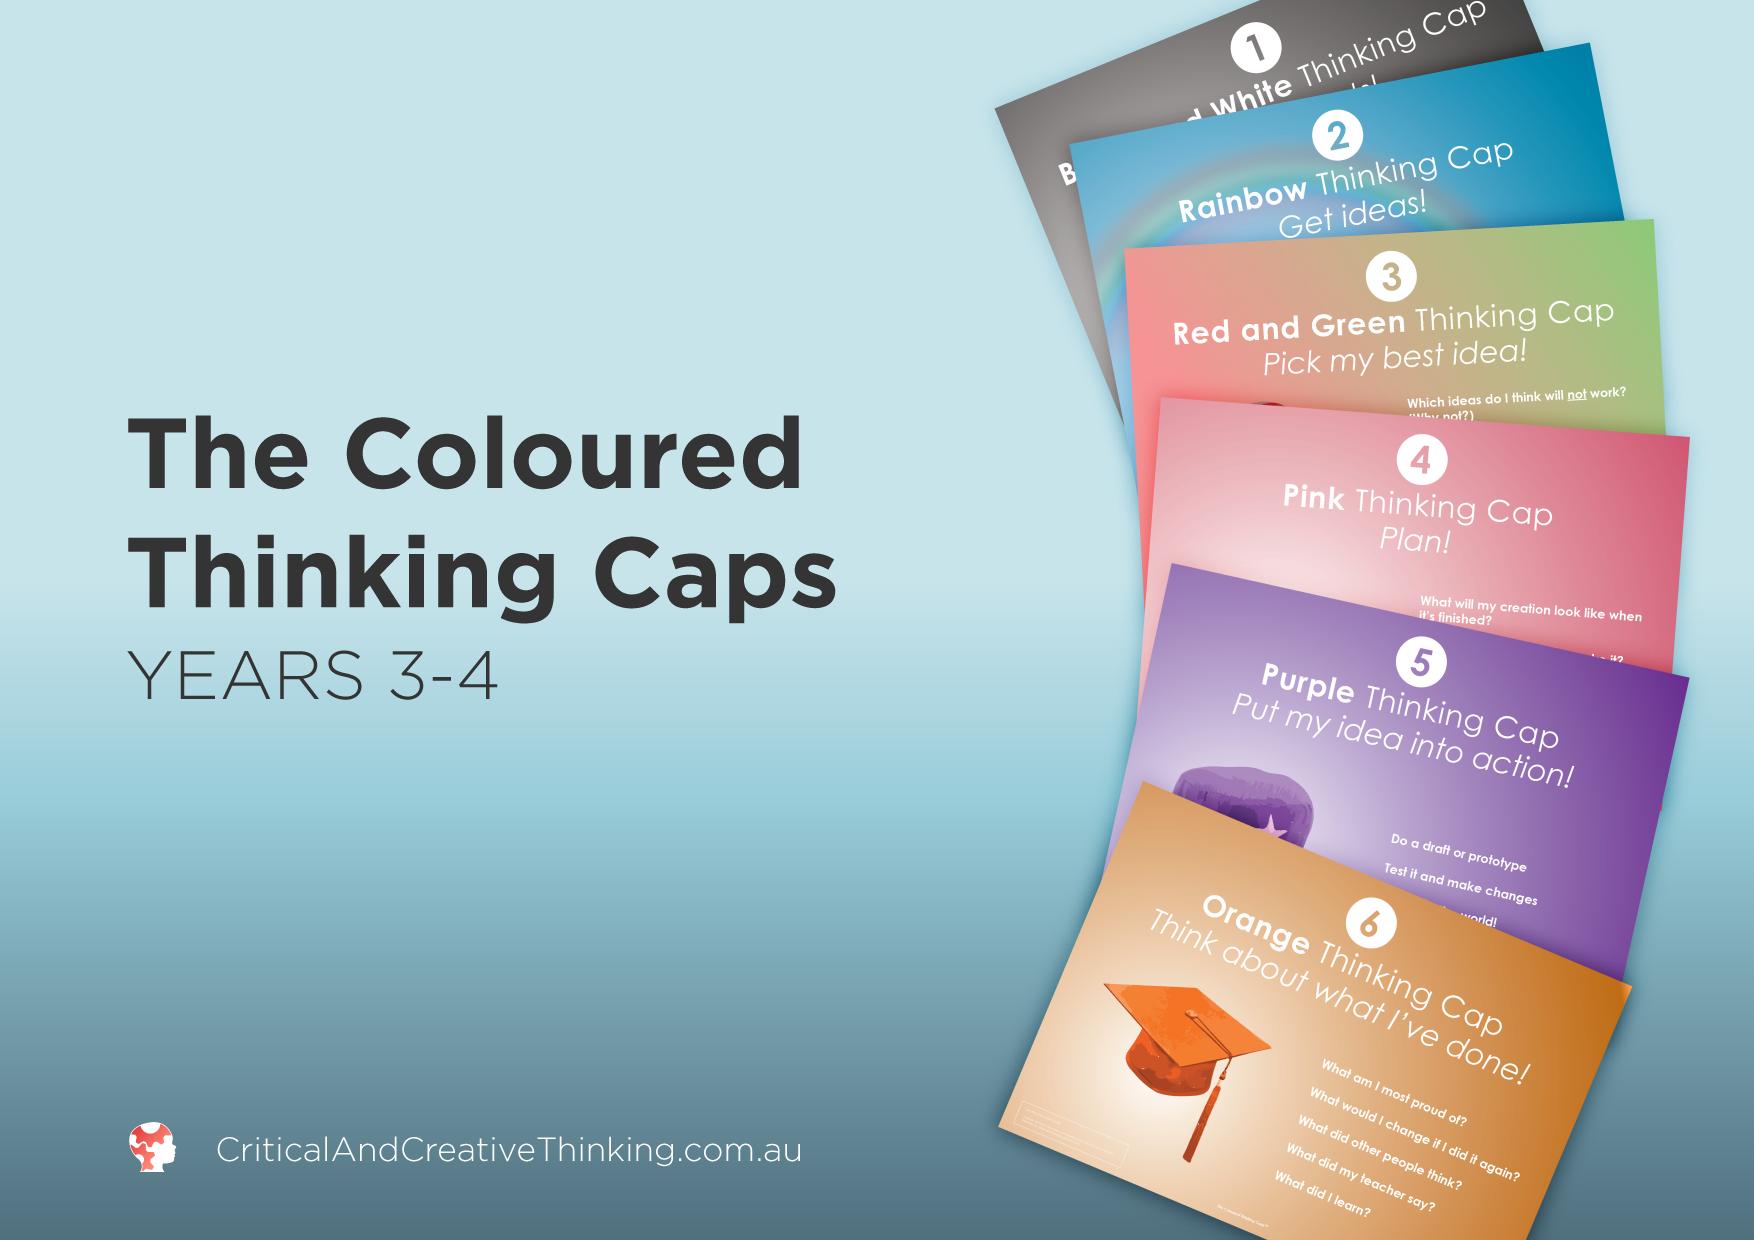 CCT coloured thinking caps year 3 - 4